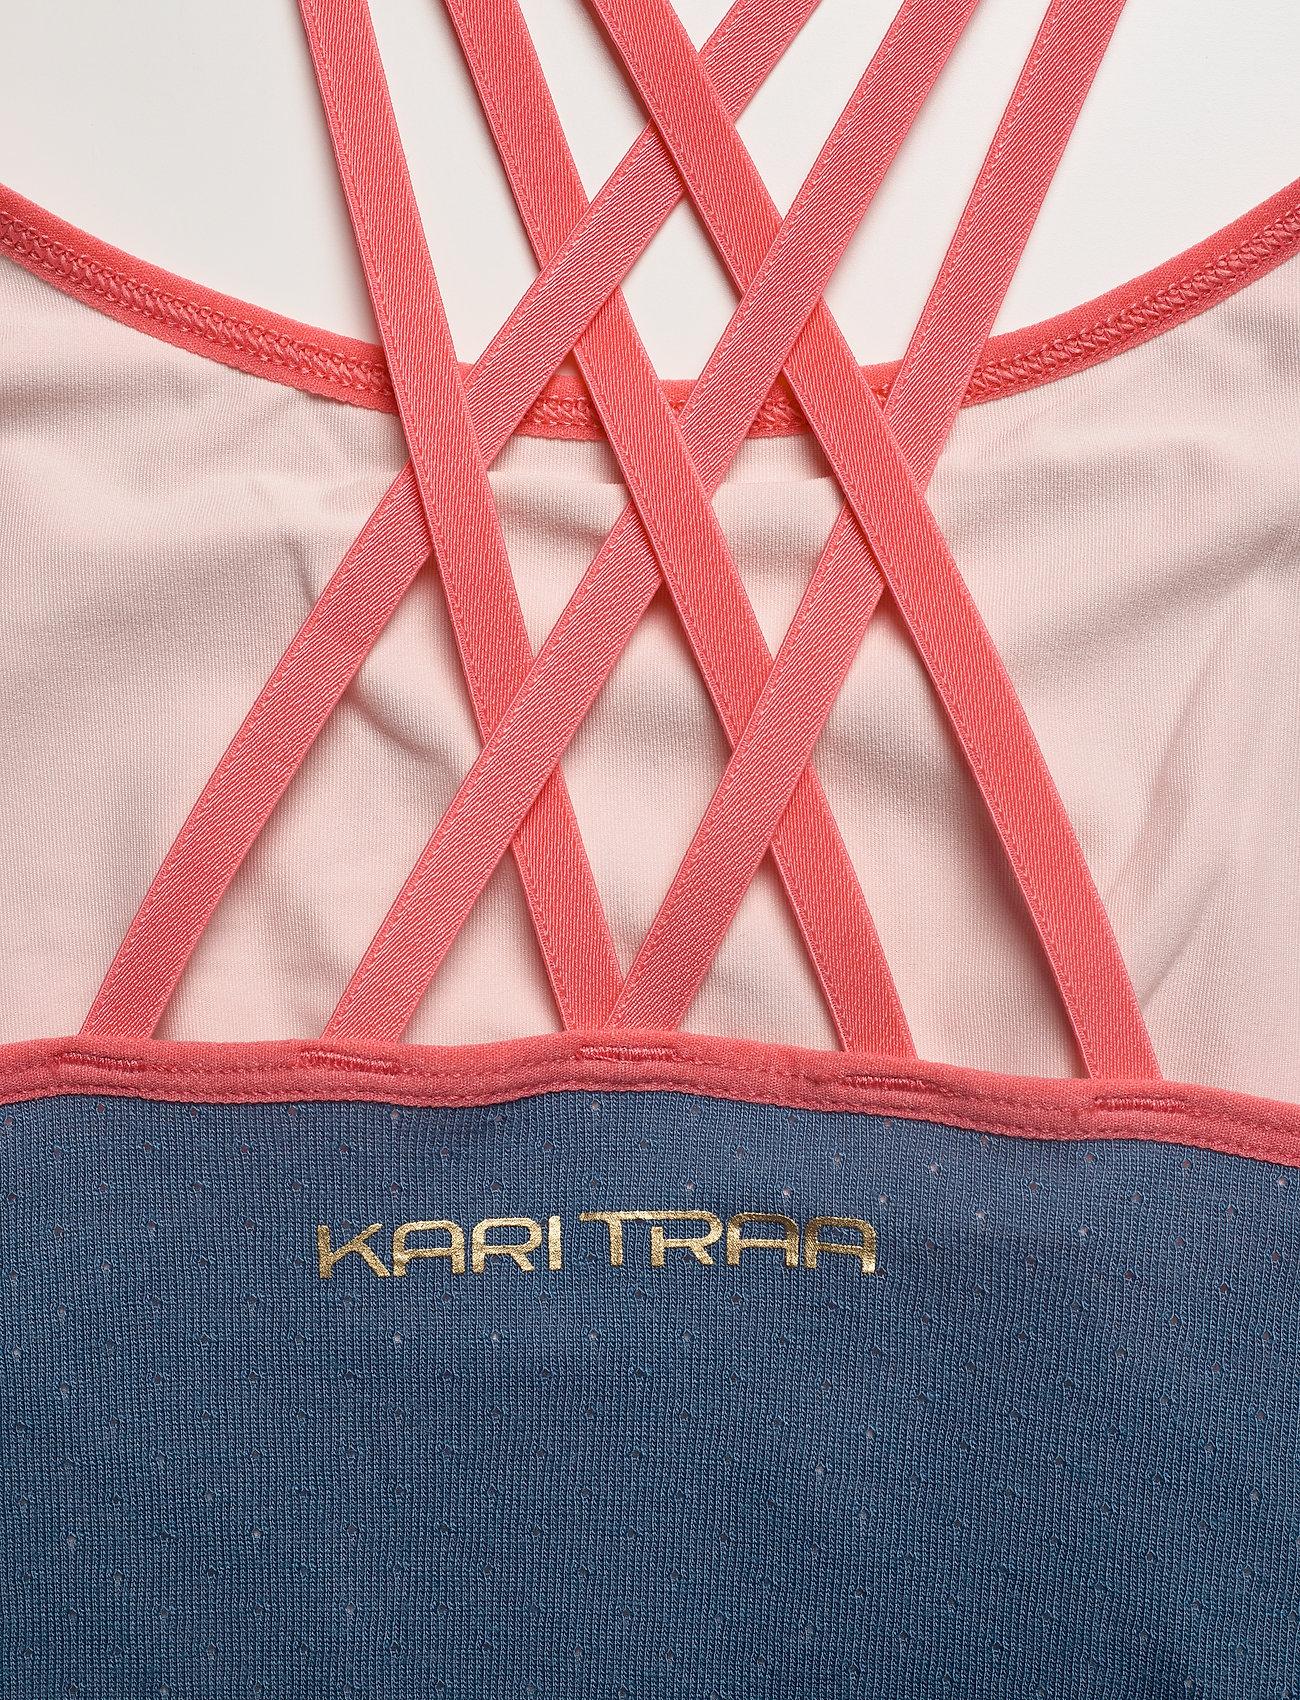 Kari Traa VICKY TOP - T-shirts & topper ASTRO - Dameklær Spesialtilbud